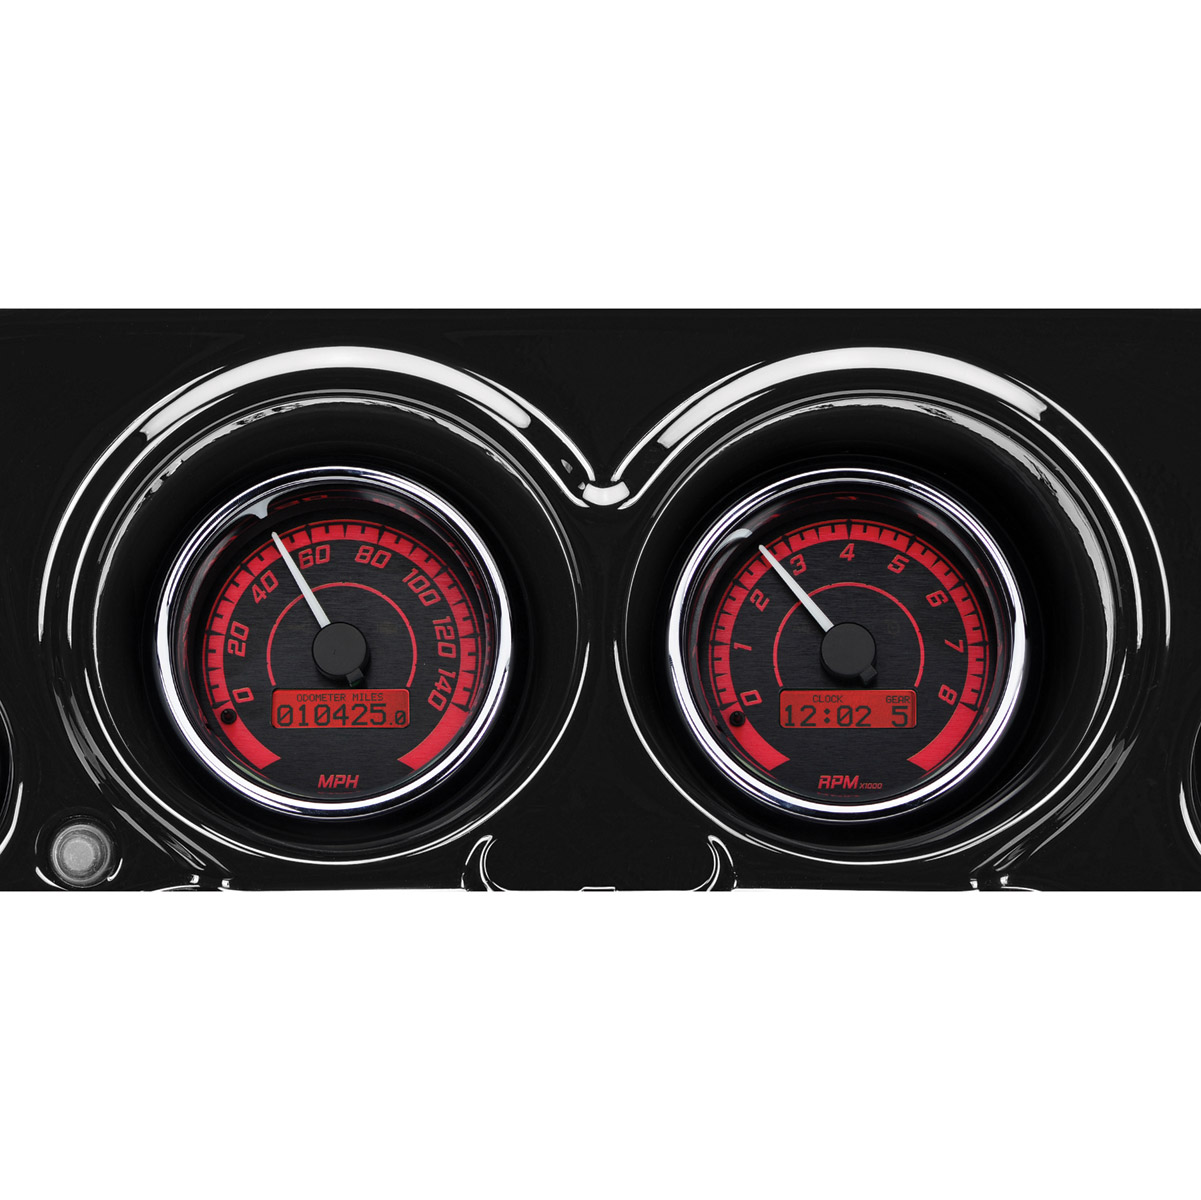 Dakota Digital MVX Two-Gauge Speedometer and Tachometer Kit